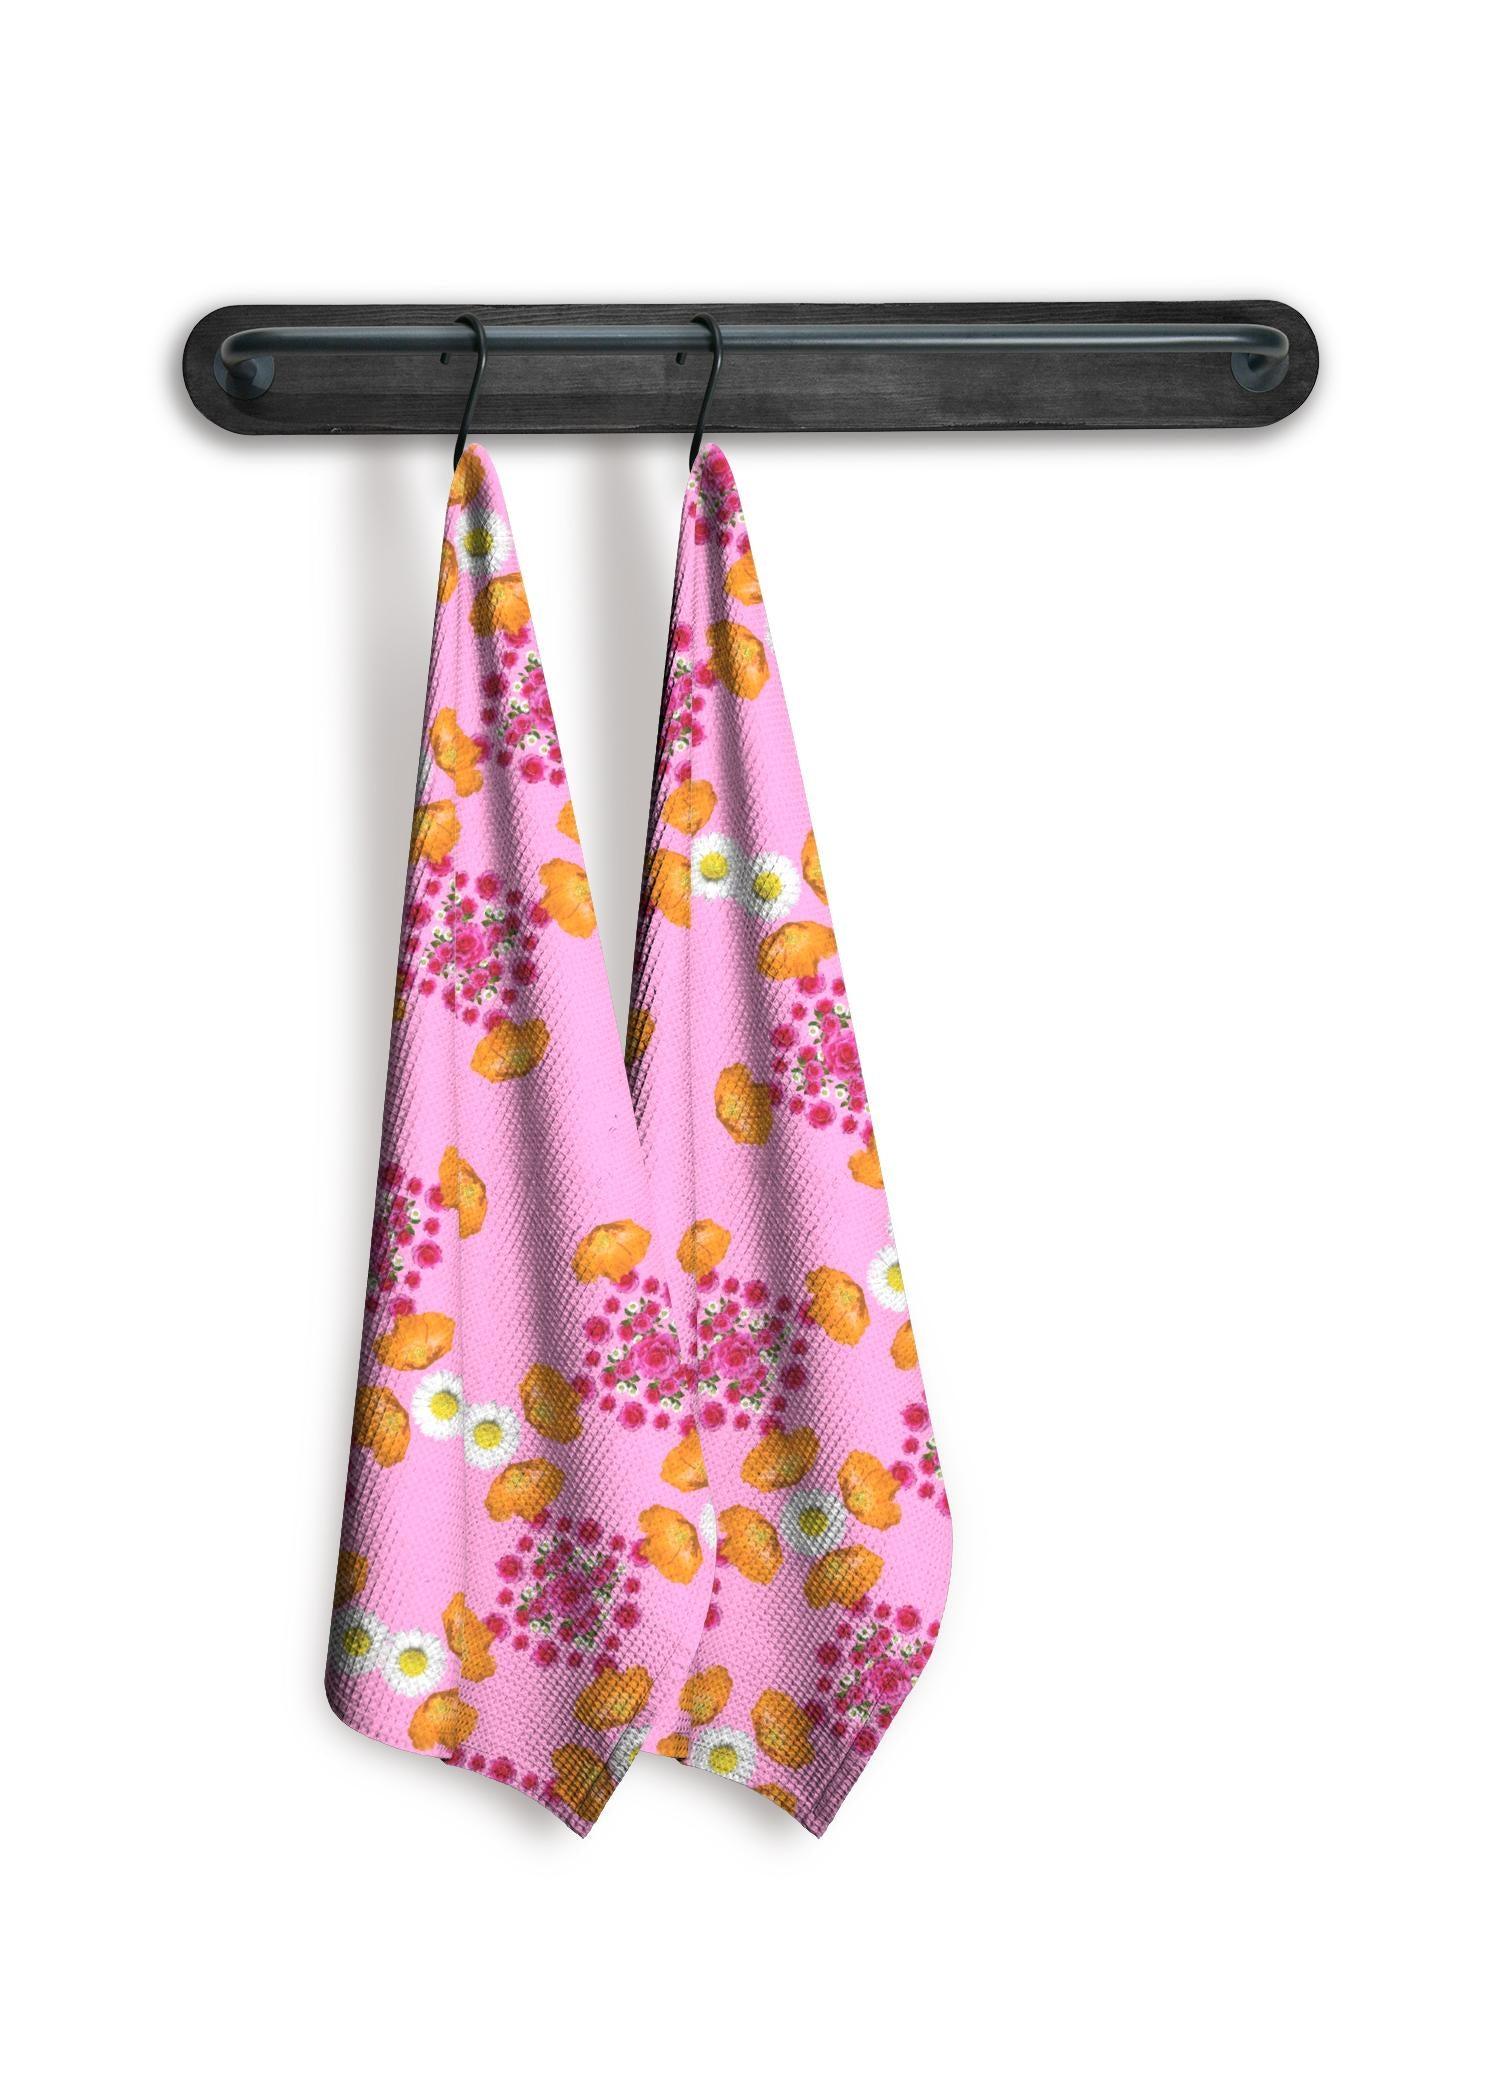 VIDA Tea Towel Set of 2 - Pink Garden Flowers Art by VIDA Original Artist  - Size: Waffle set